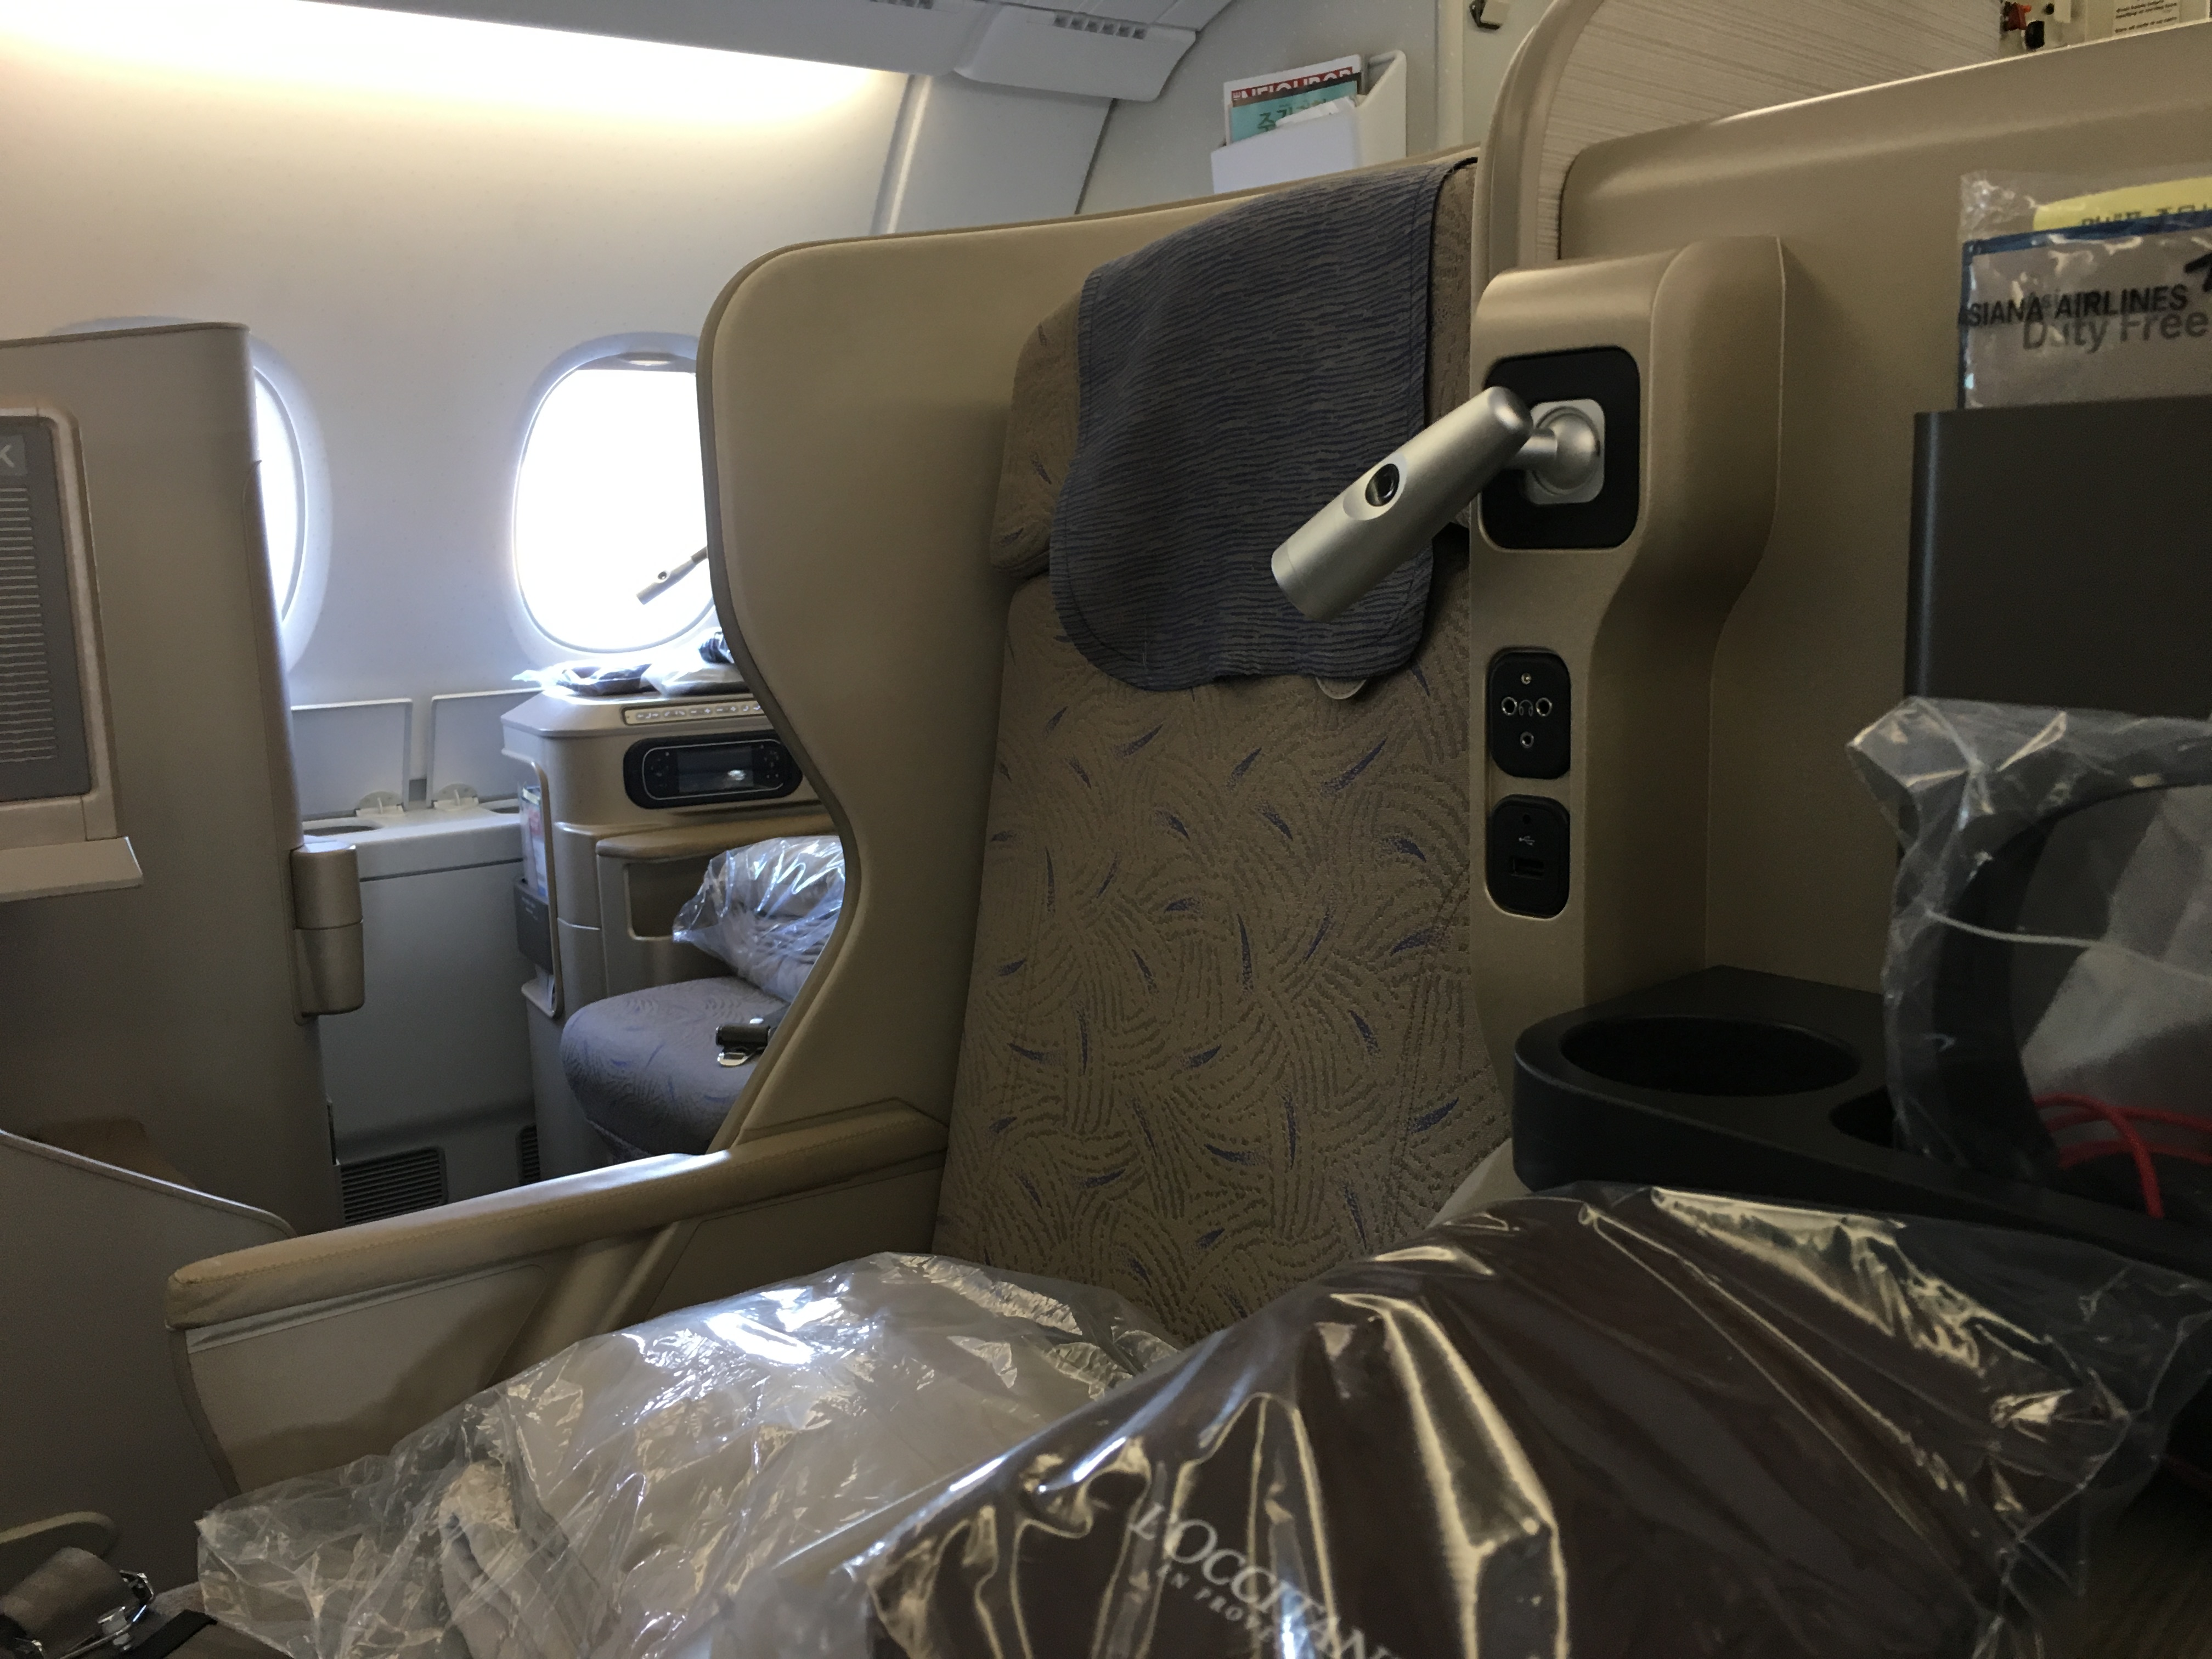 Business Class Review : アシアナ航空(OZ) OZ541 ソウル仁川(ICN) – フランクフルト(FRA) エアバス A380